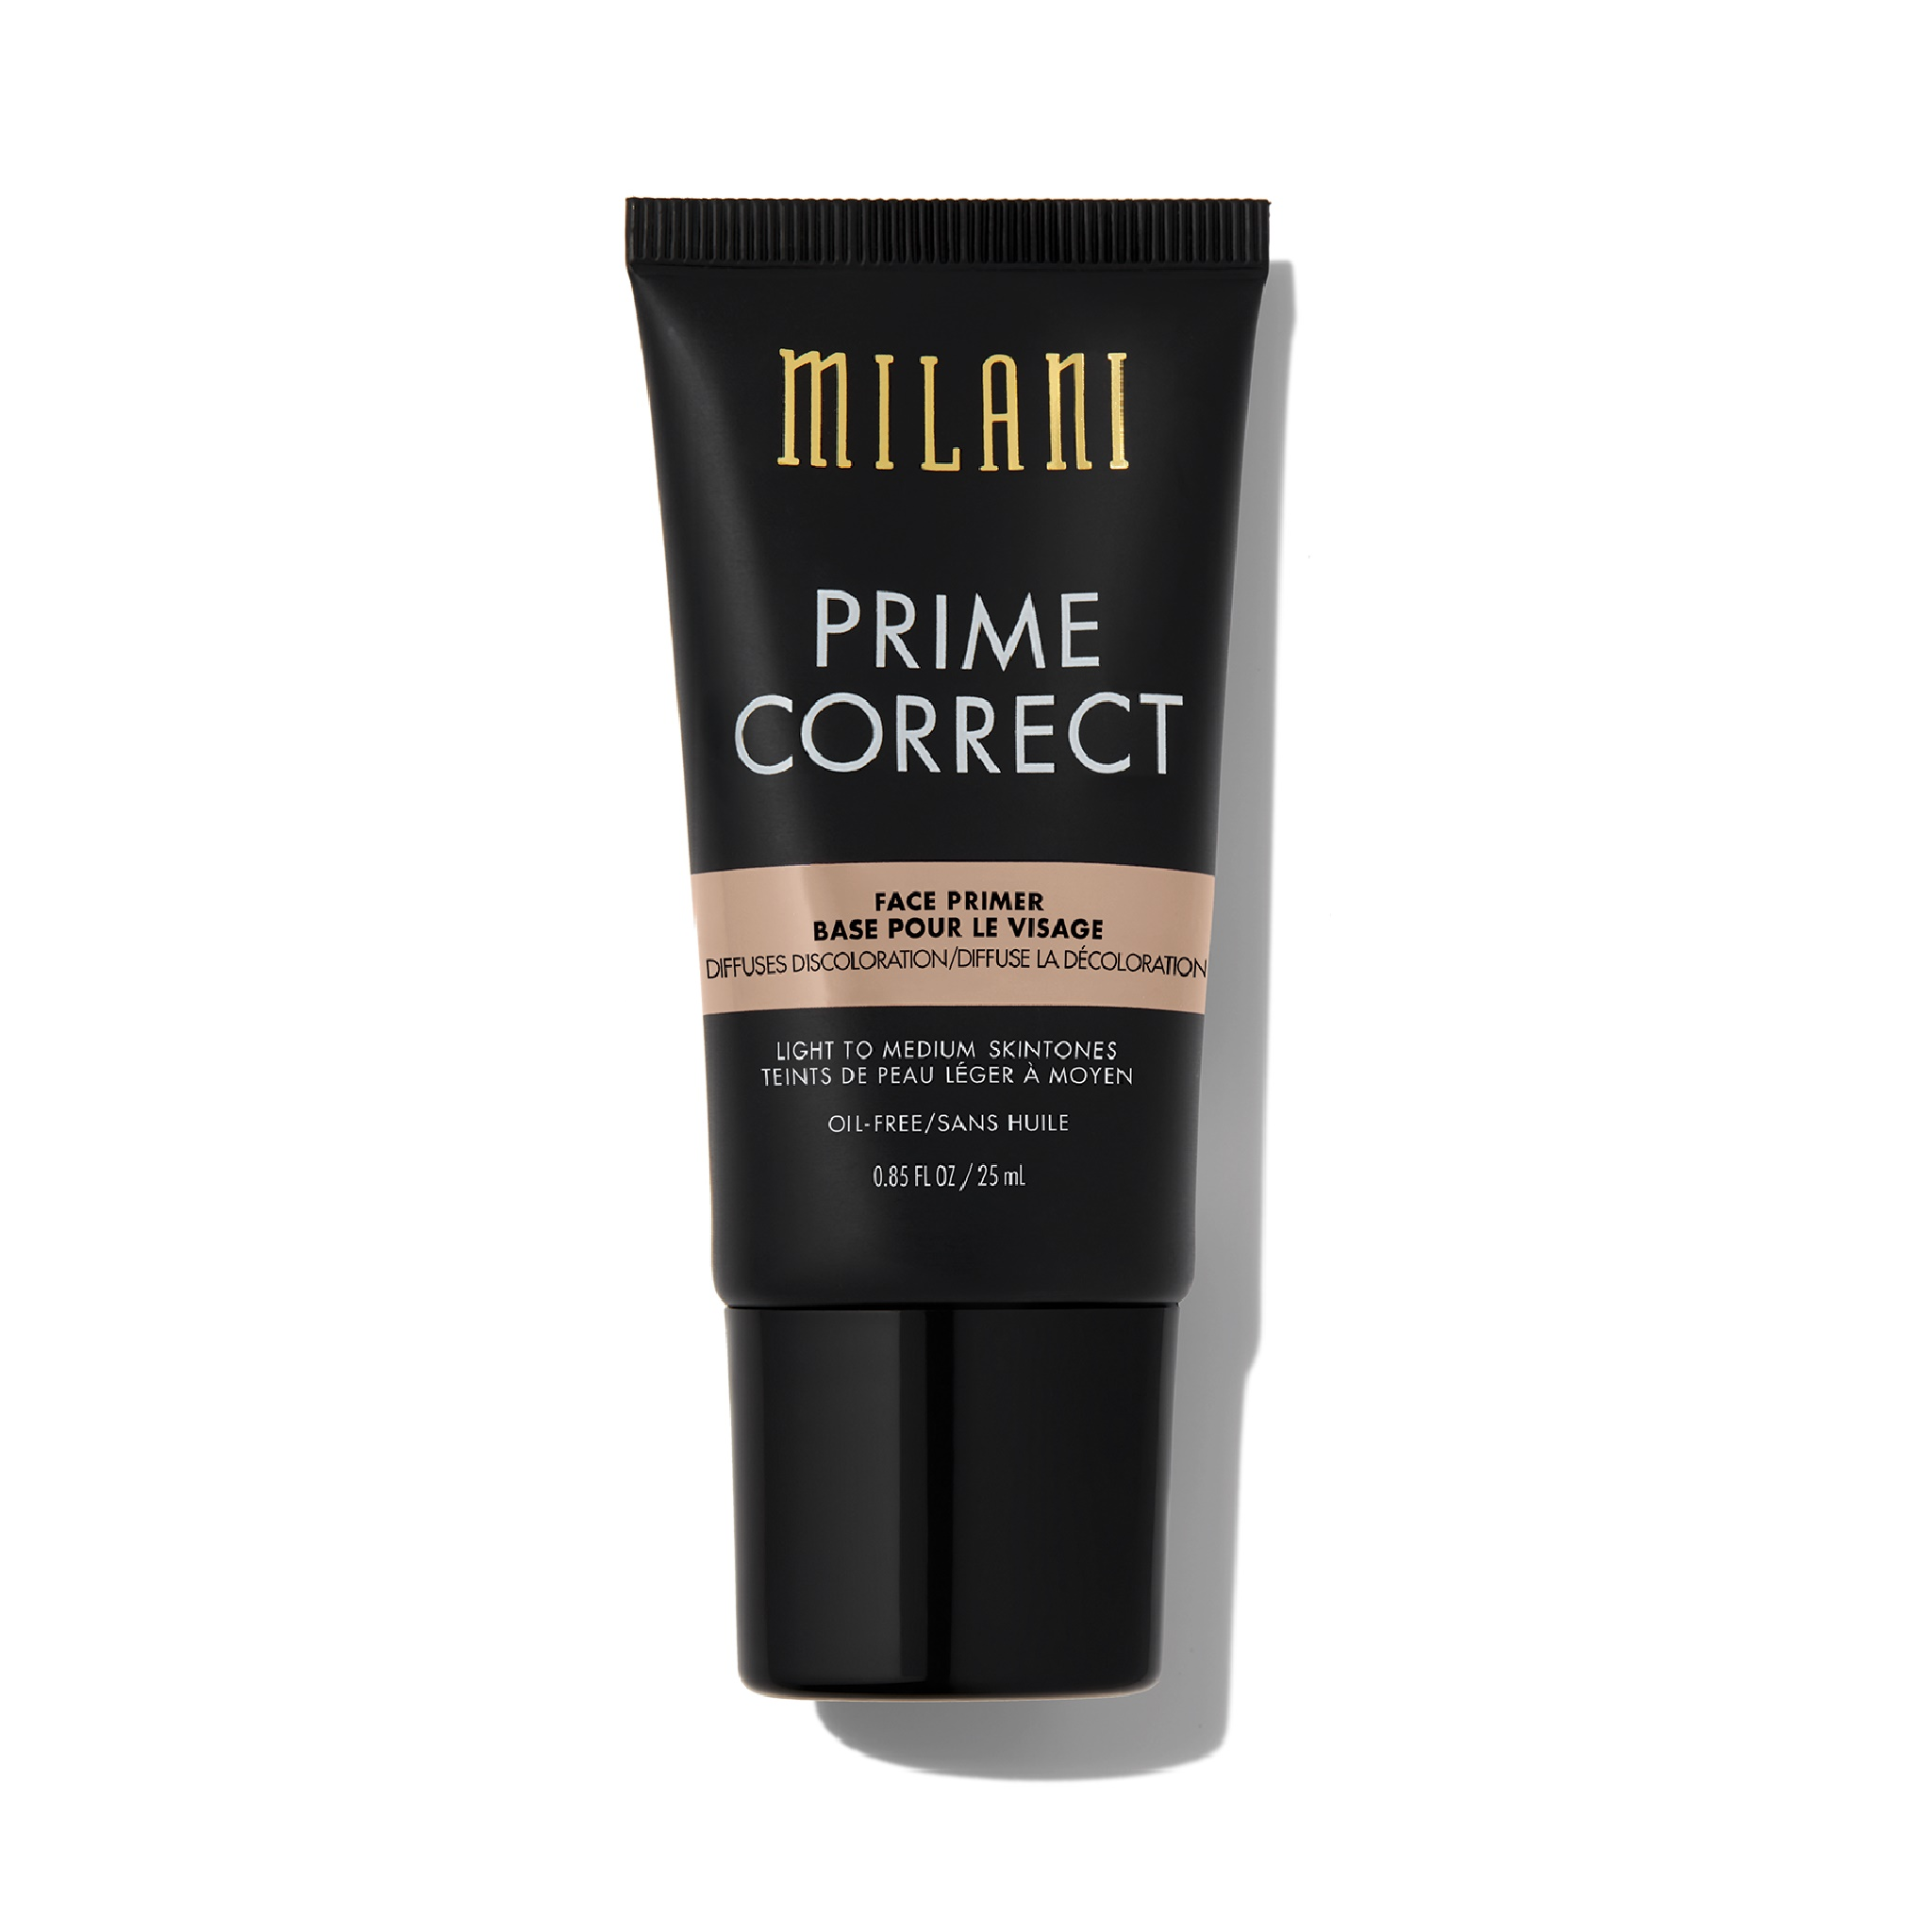 Makeup Primer για τις δυσχρωμίες από την εταιρεία Milani